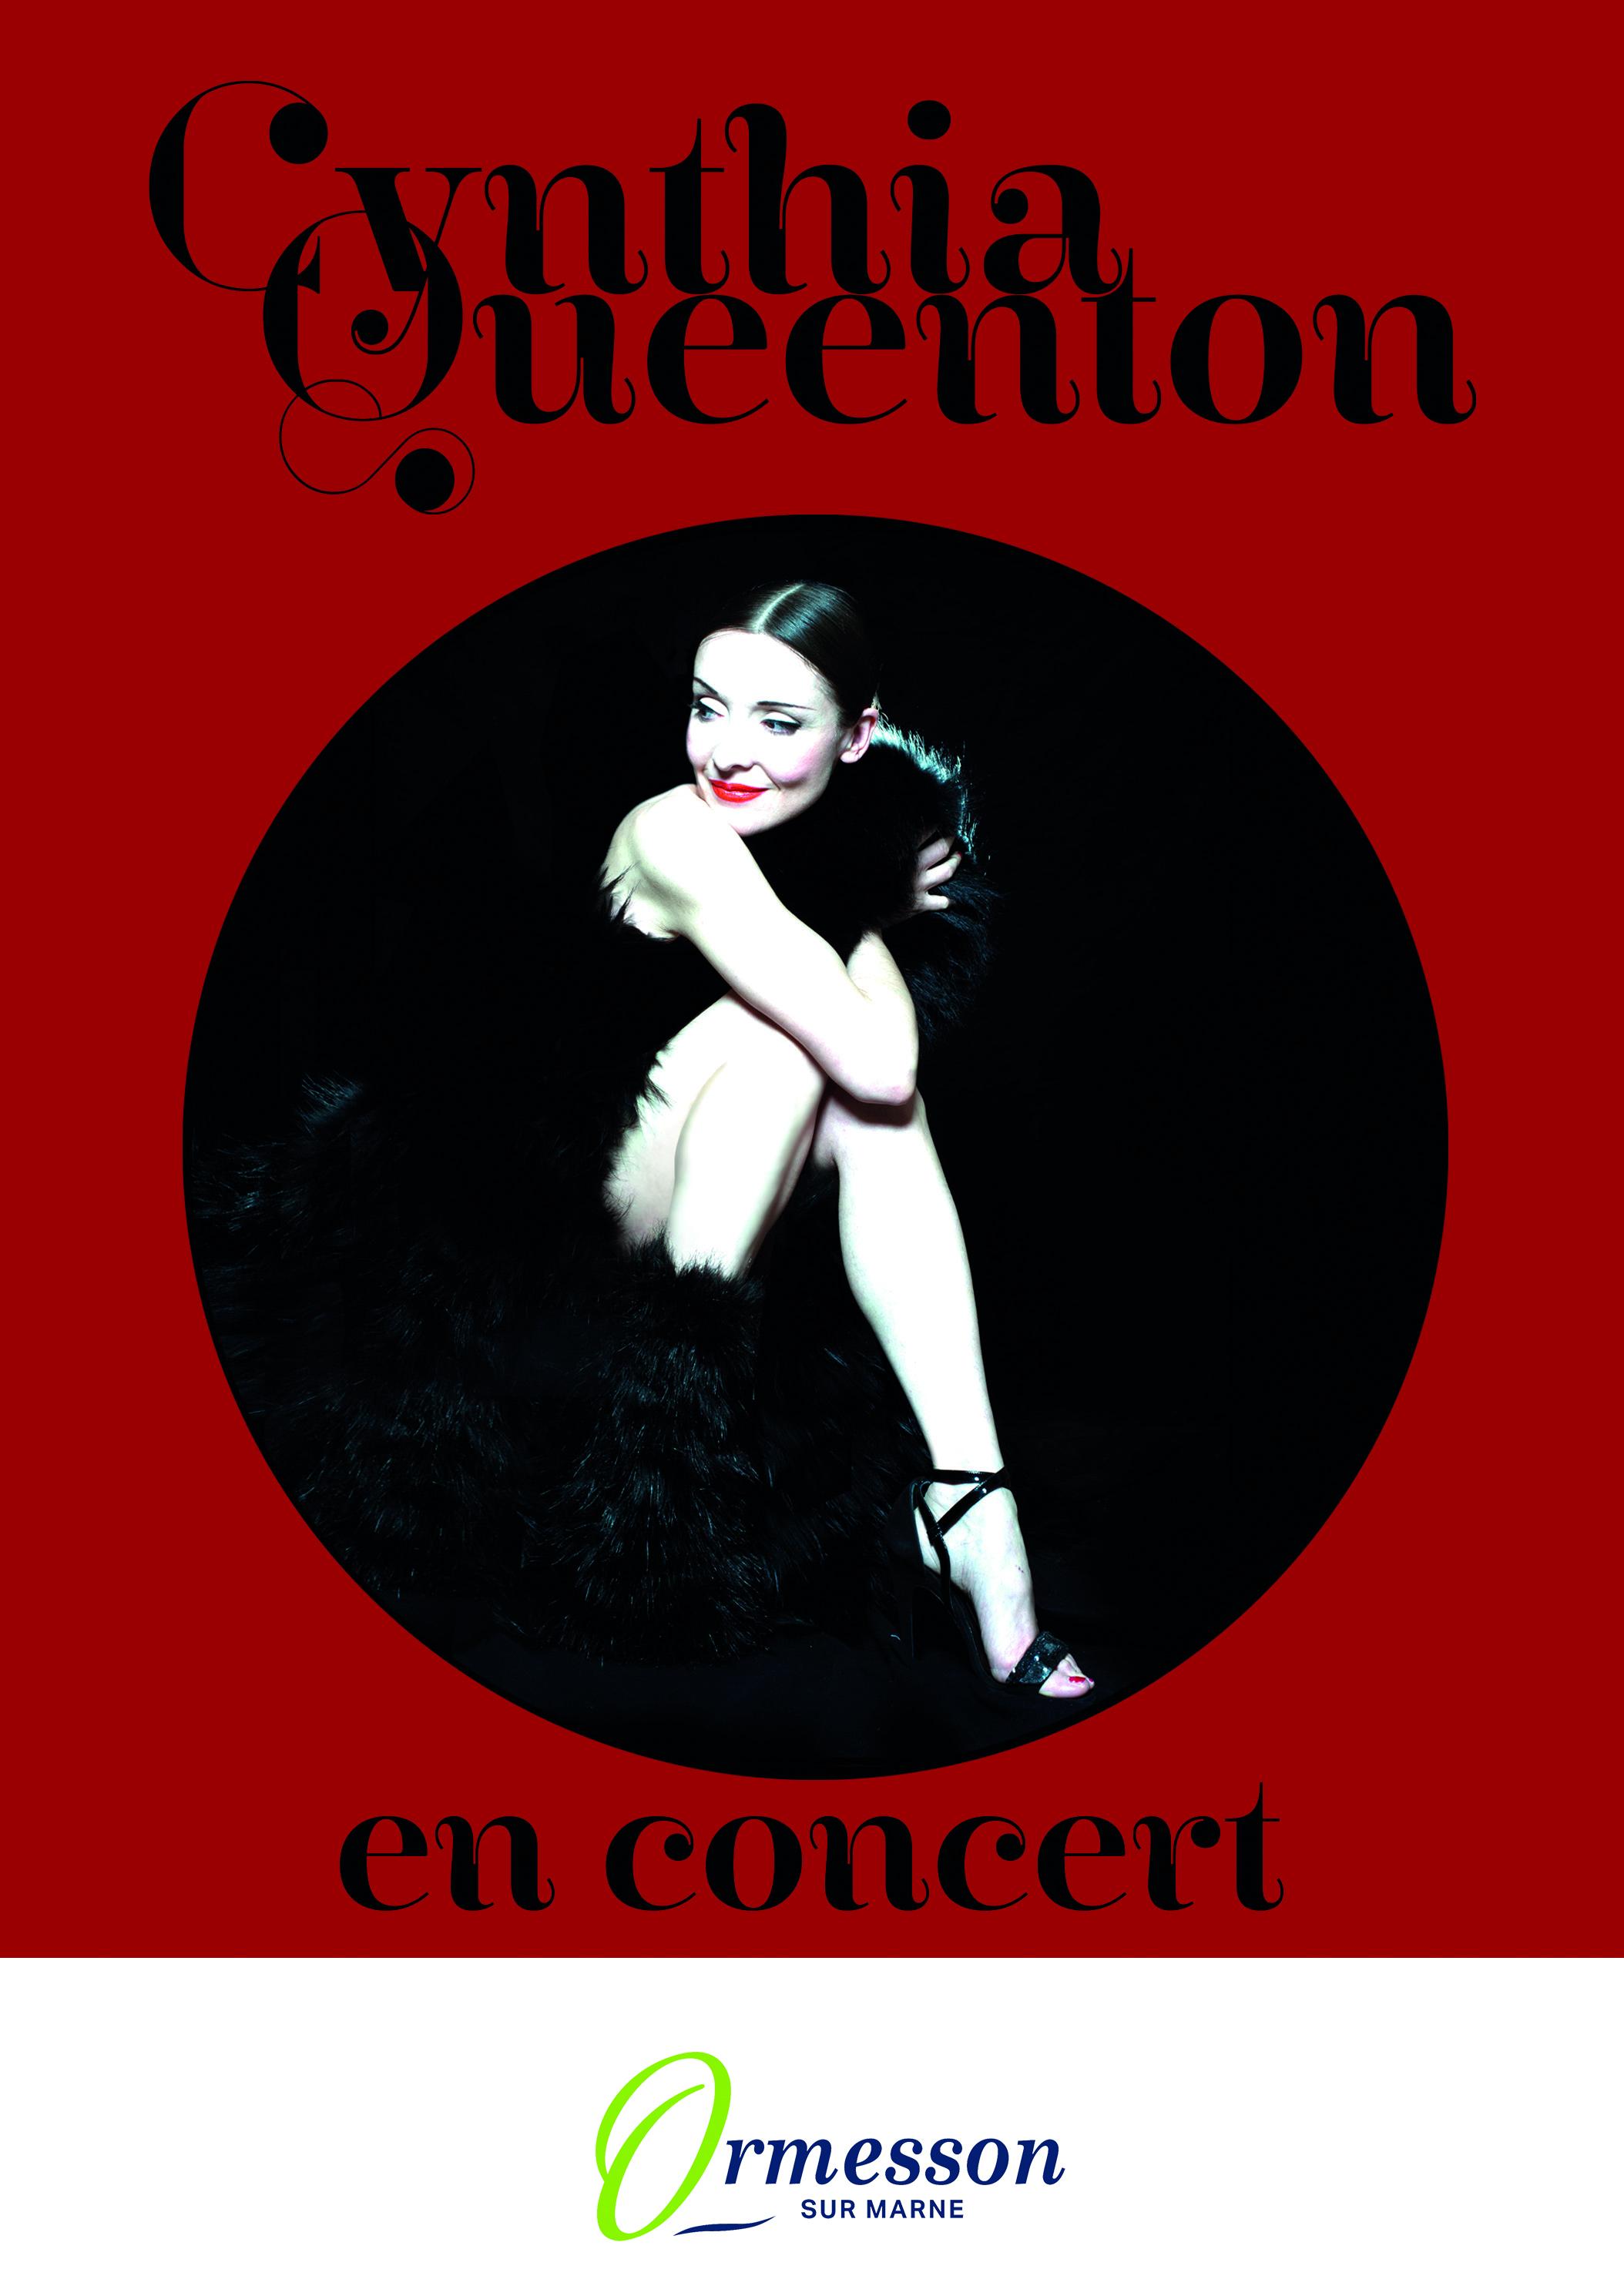 Cynthia Queenton en concert au bar